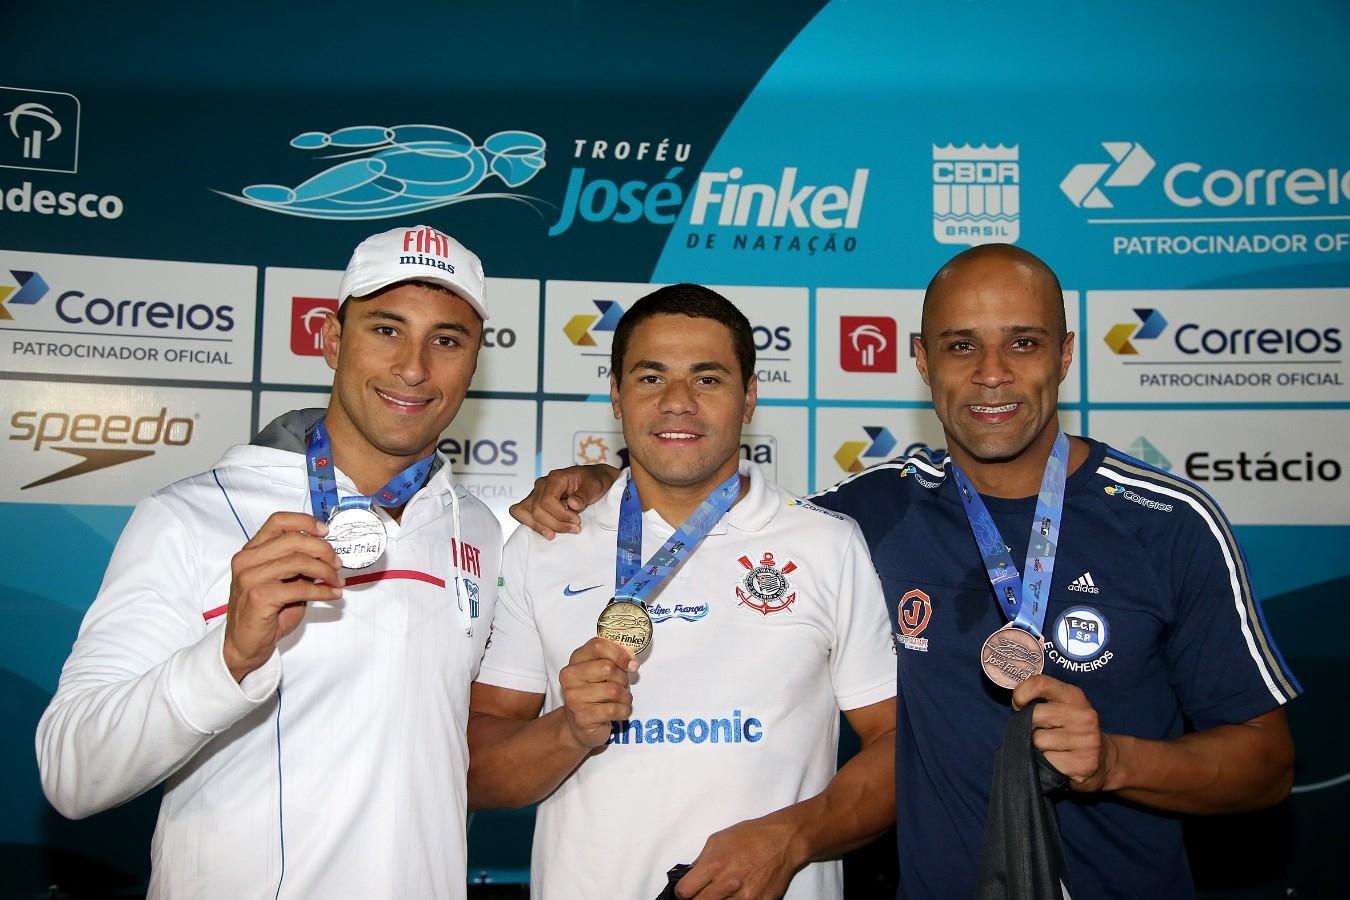 Felipe Franca - Trofeu Jose Finkel de Natacao no Clube Internacional de Regatas. 15 de Setembro de 2016, Santos, SP, Brasil. Foto:Satiro Sodré/SSPress.